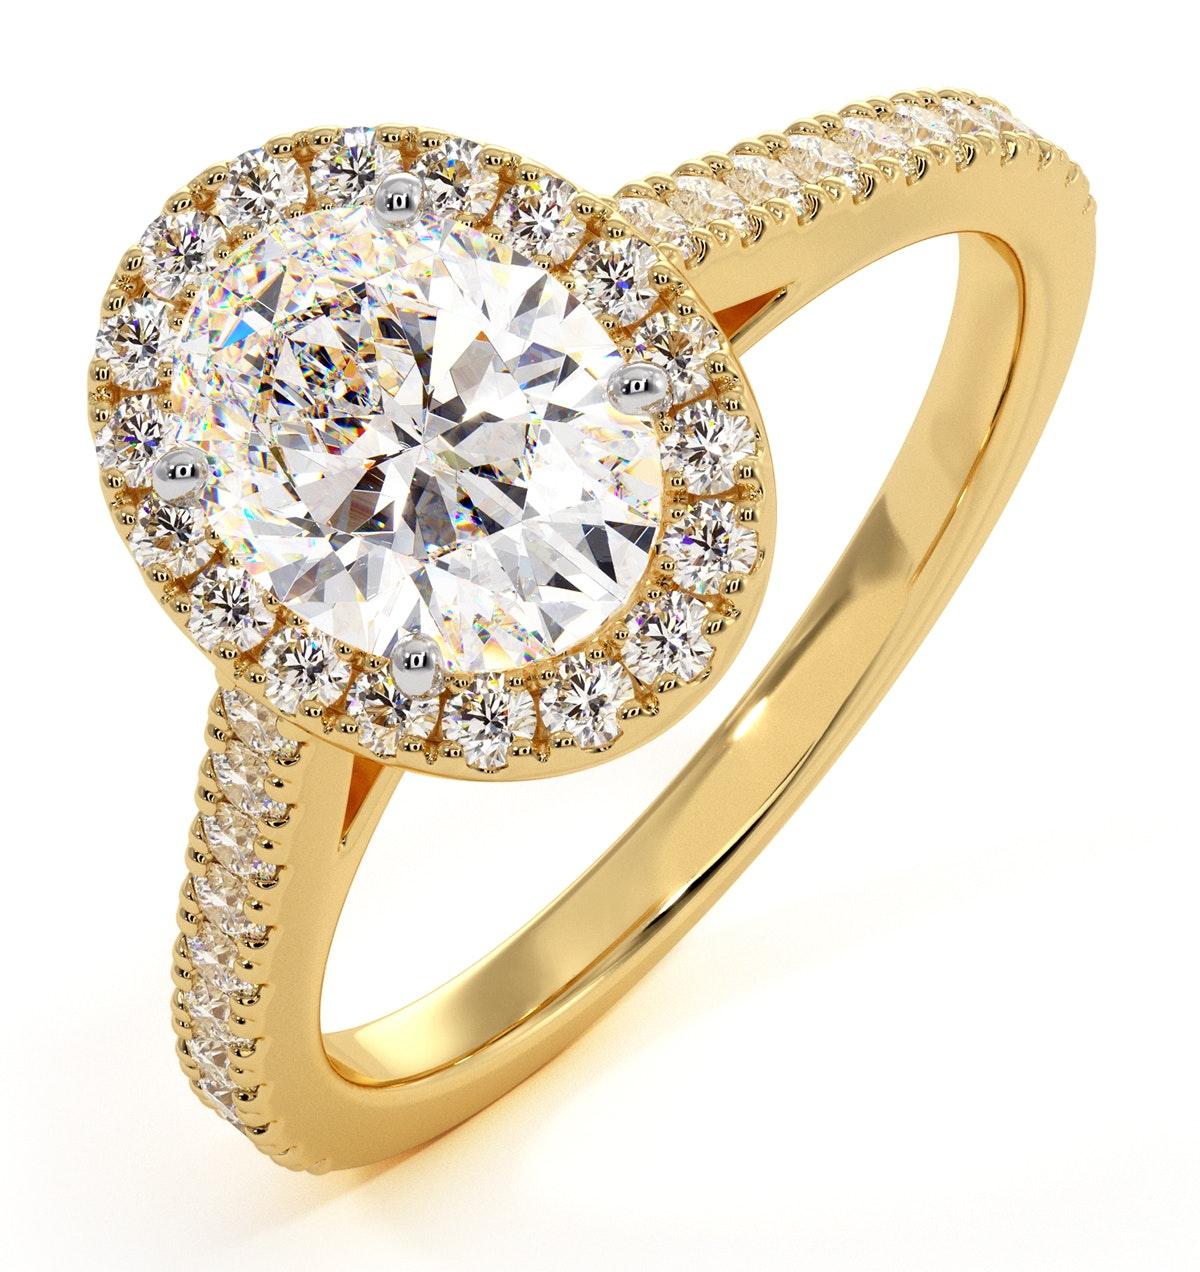 Georgina GIA Oval Diamond Halo Engagement Ring 18K Gold 1.55ct G/VS2